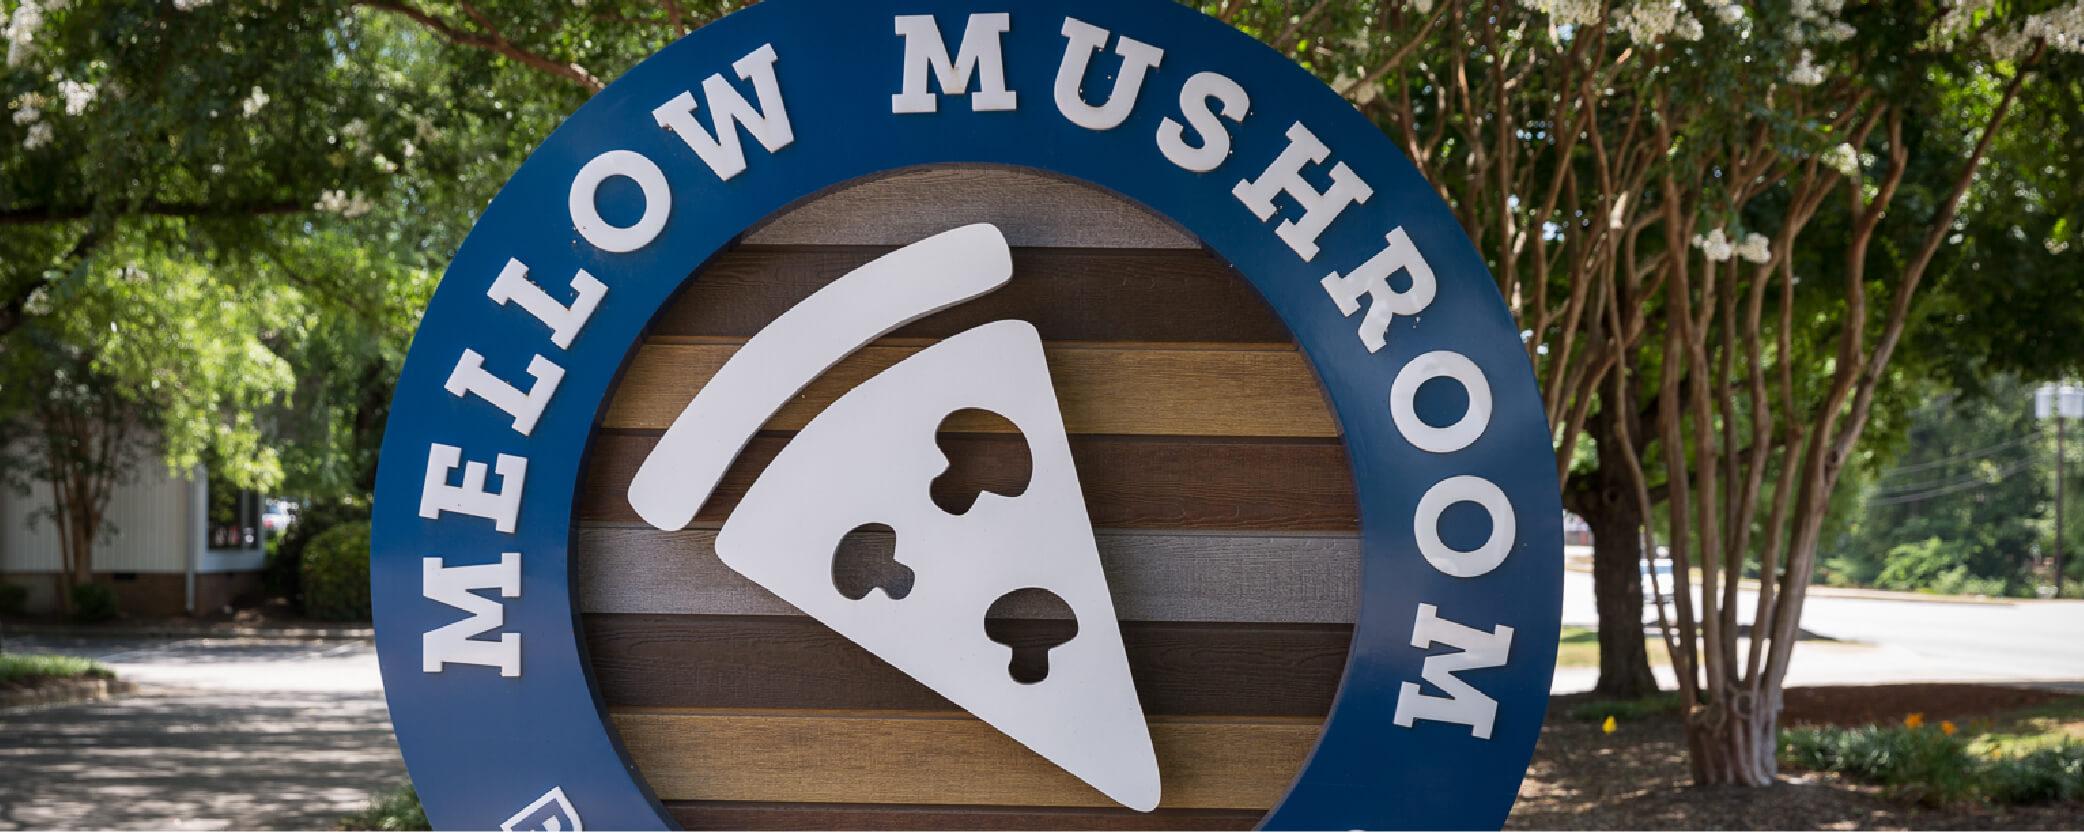 Mellow Mushroom Clemson - Street Signage